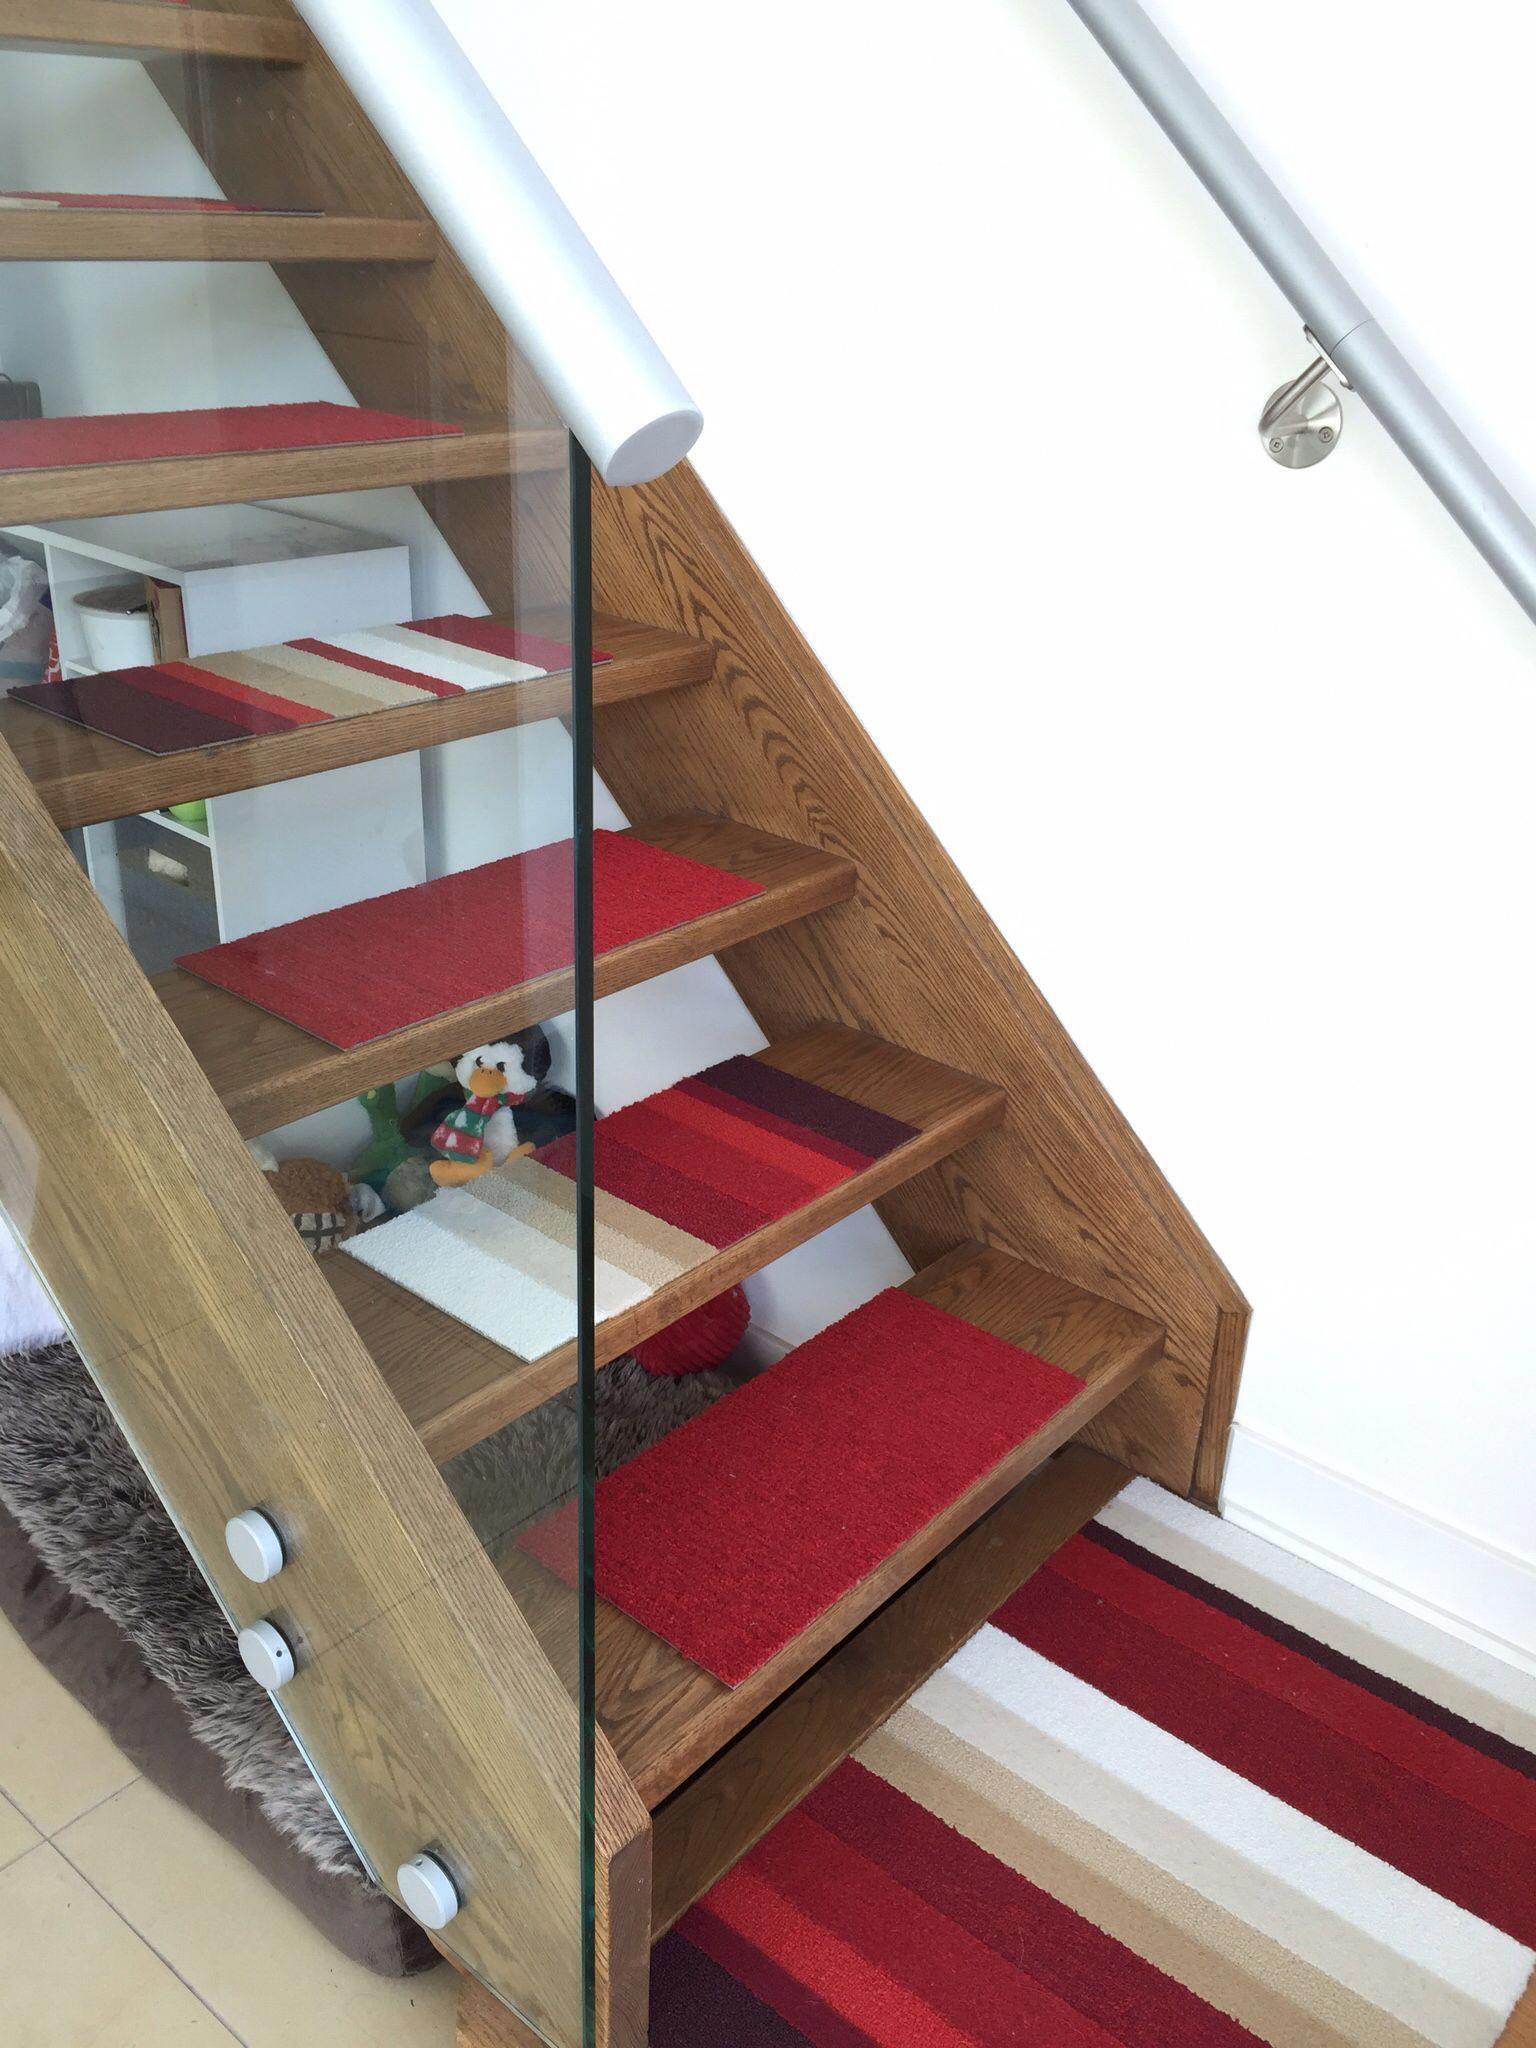 Best Carpetrunnerslosangeles Carpetsforsteps Carpet Tiles 400 x 300